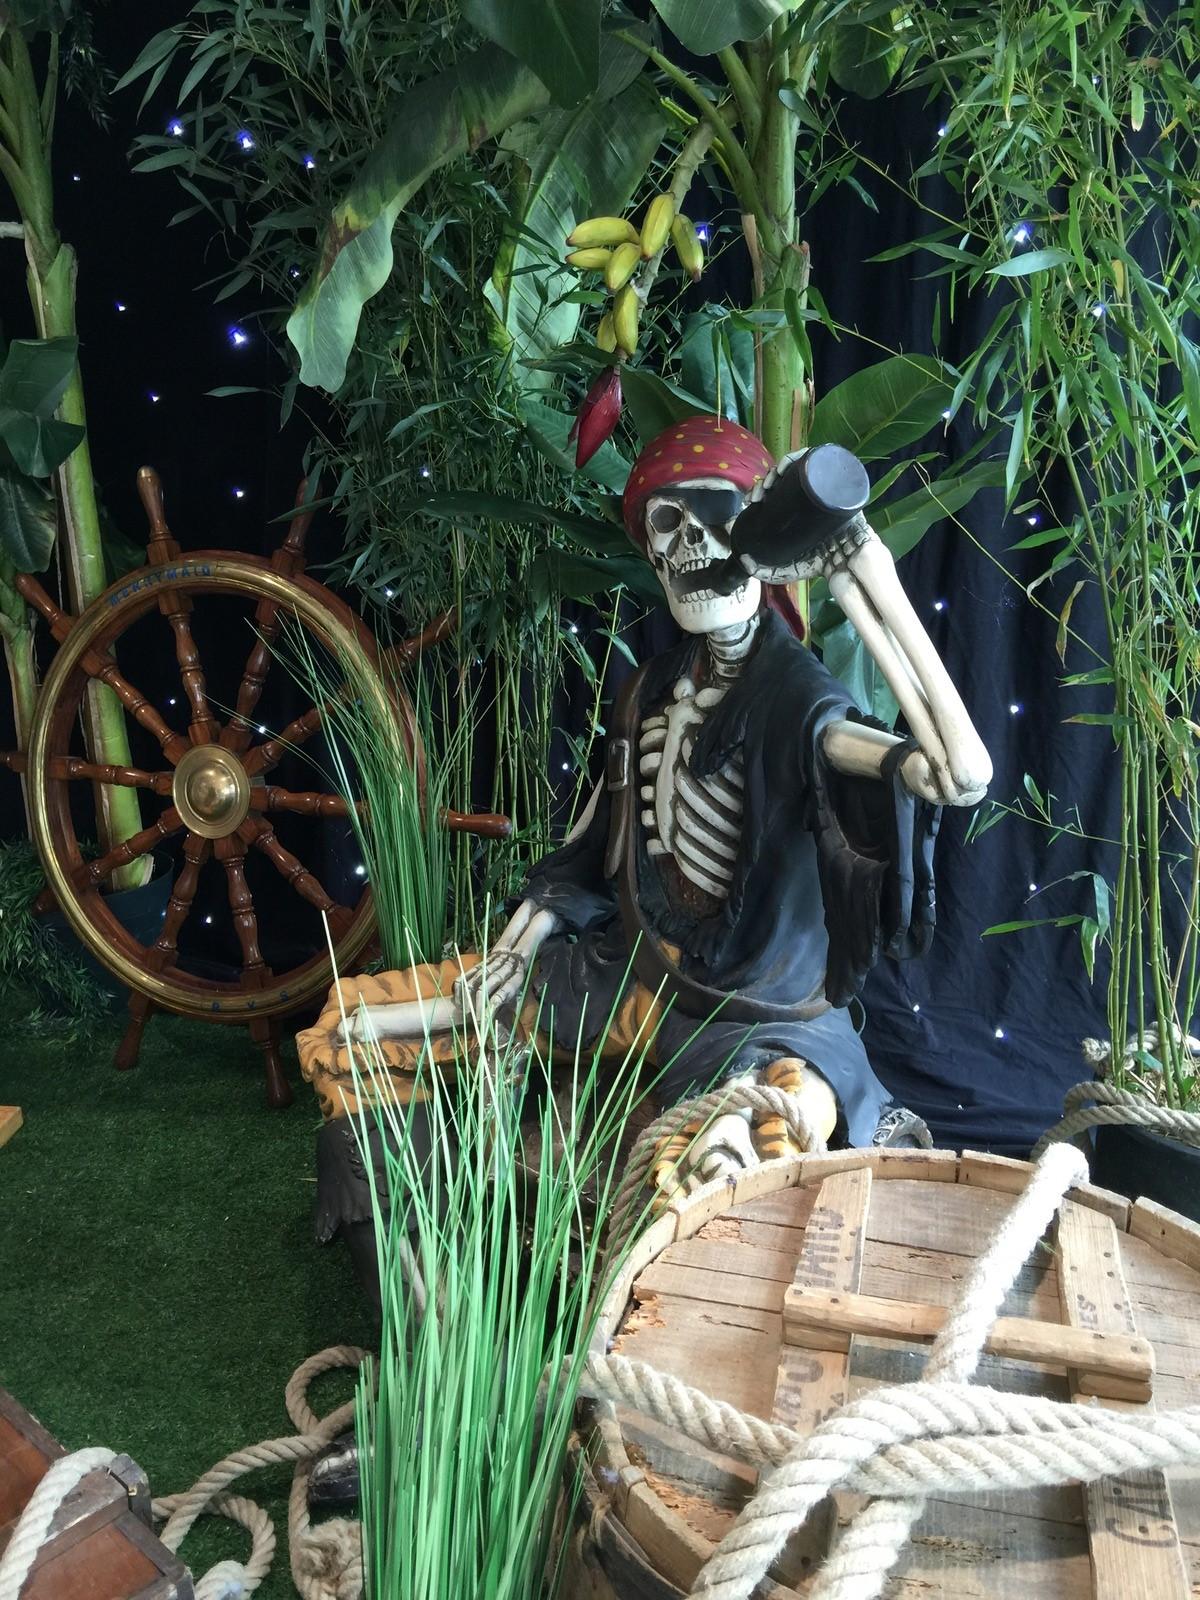 Location de statue de squelette pirate